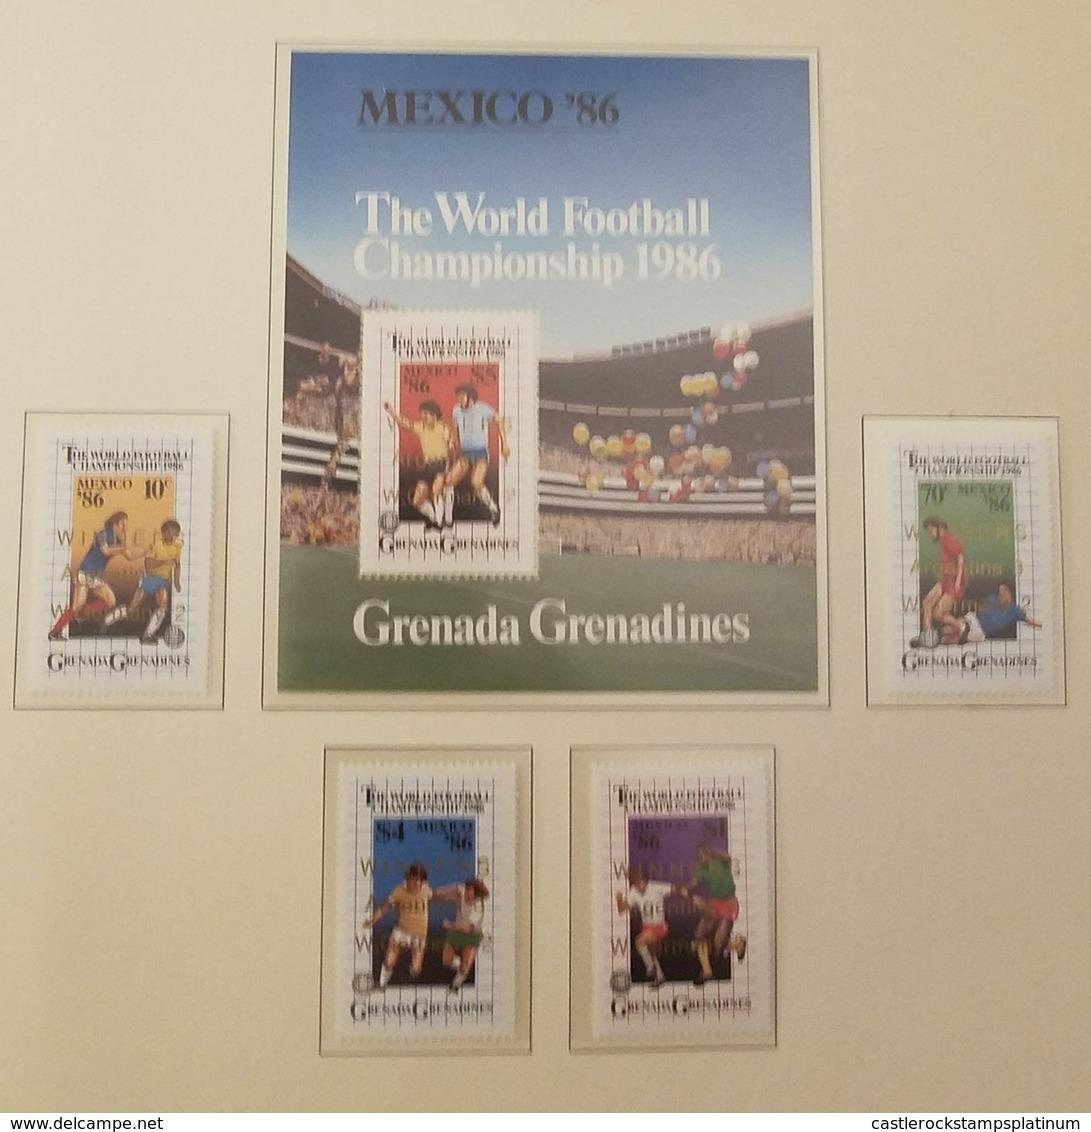 O) 1986 GRENADA GRENADINES, THE WORLD FOOTBALL - 1986 WORLD CUP SOCCER CHAMPIONSHIPS -SOCCER PLAYS - SCT 739-742 -SCT 74 - Grenada (1974-...)